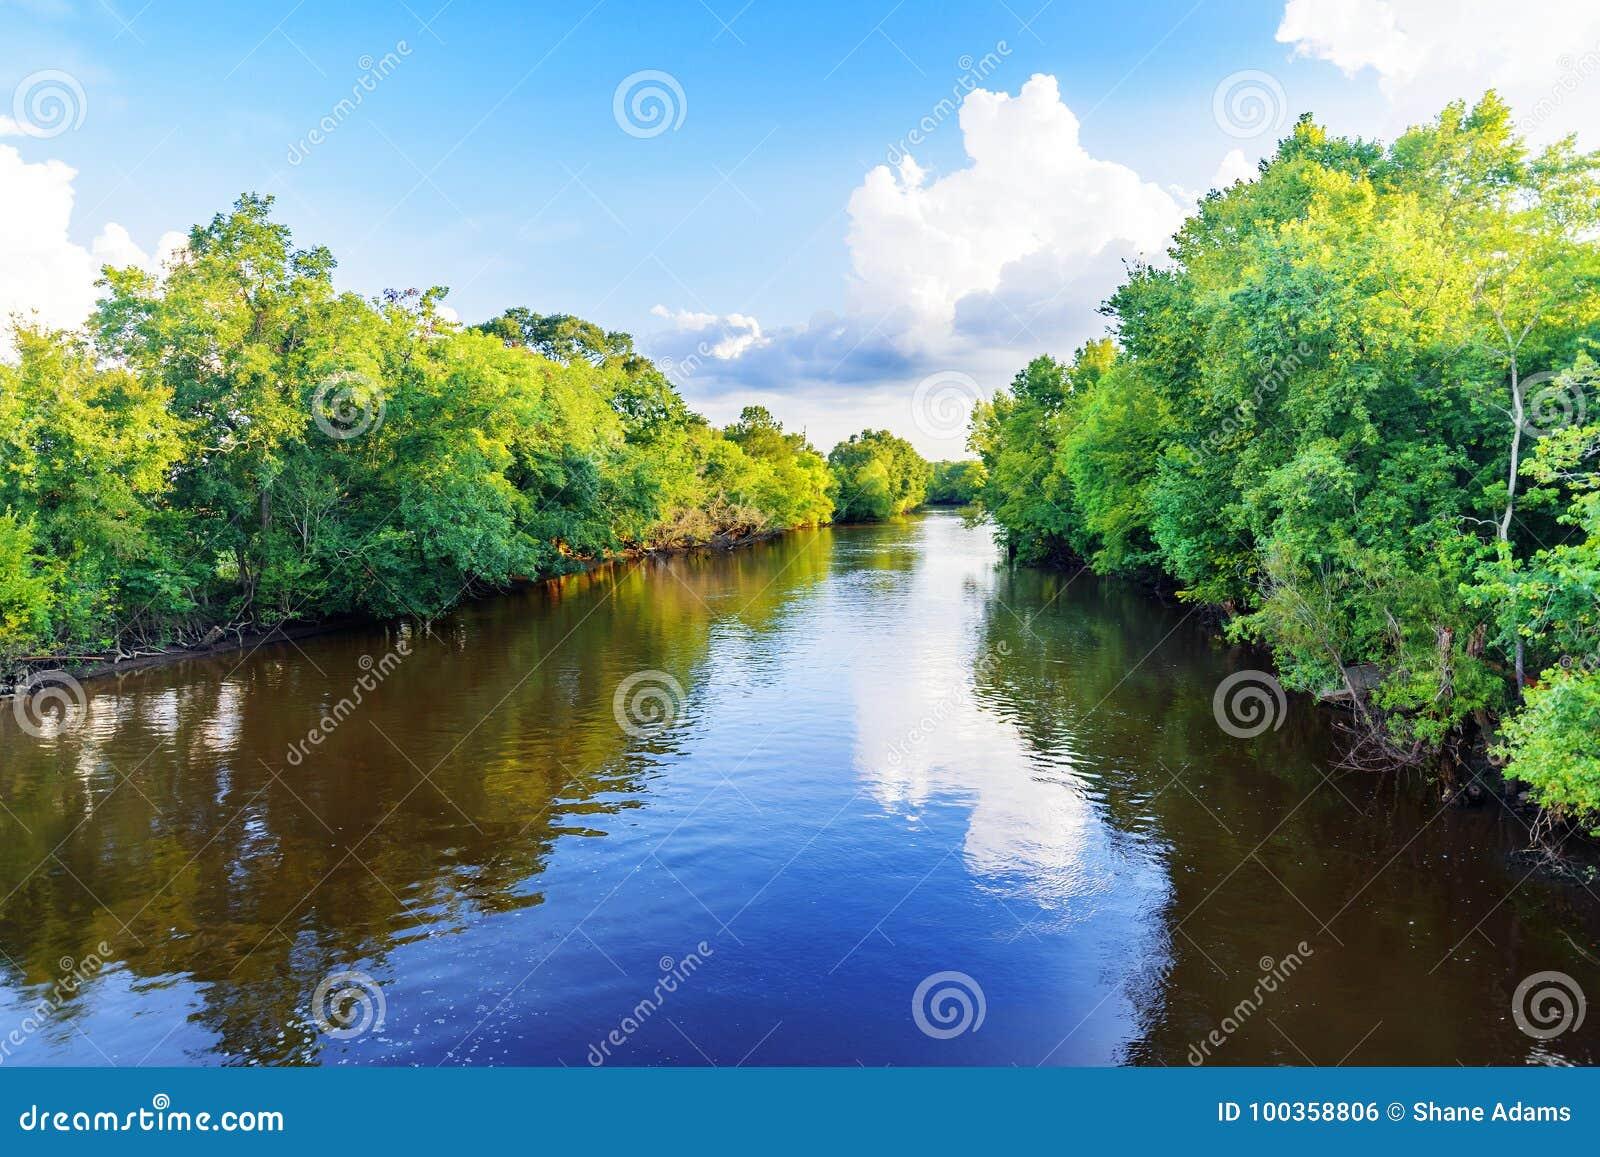 Bayou de la Louisiane